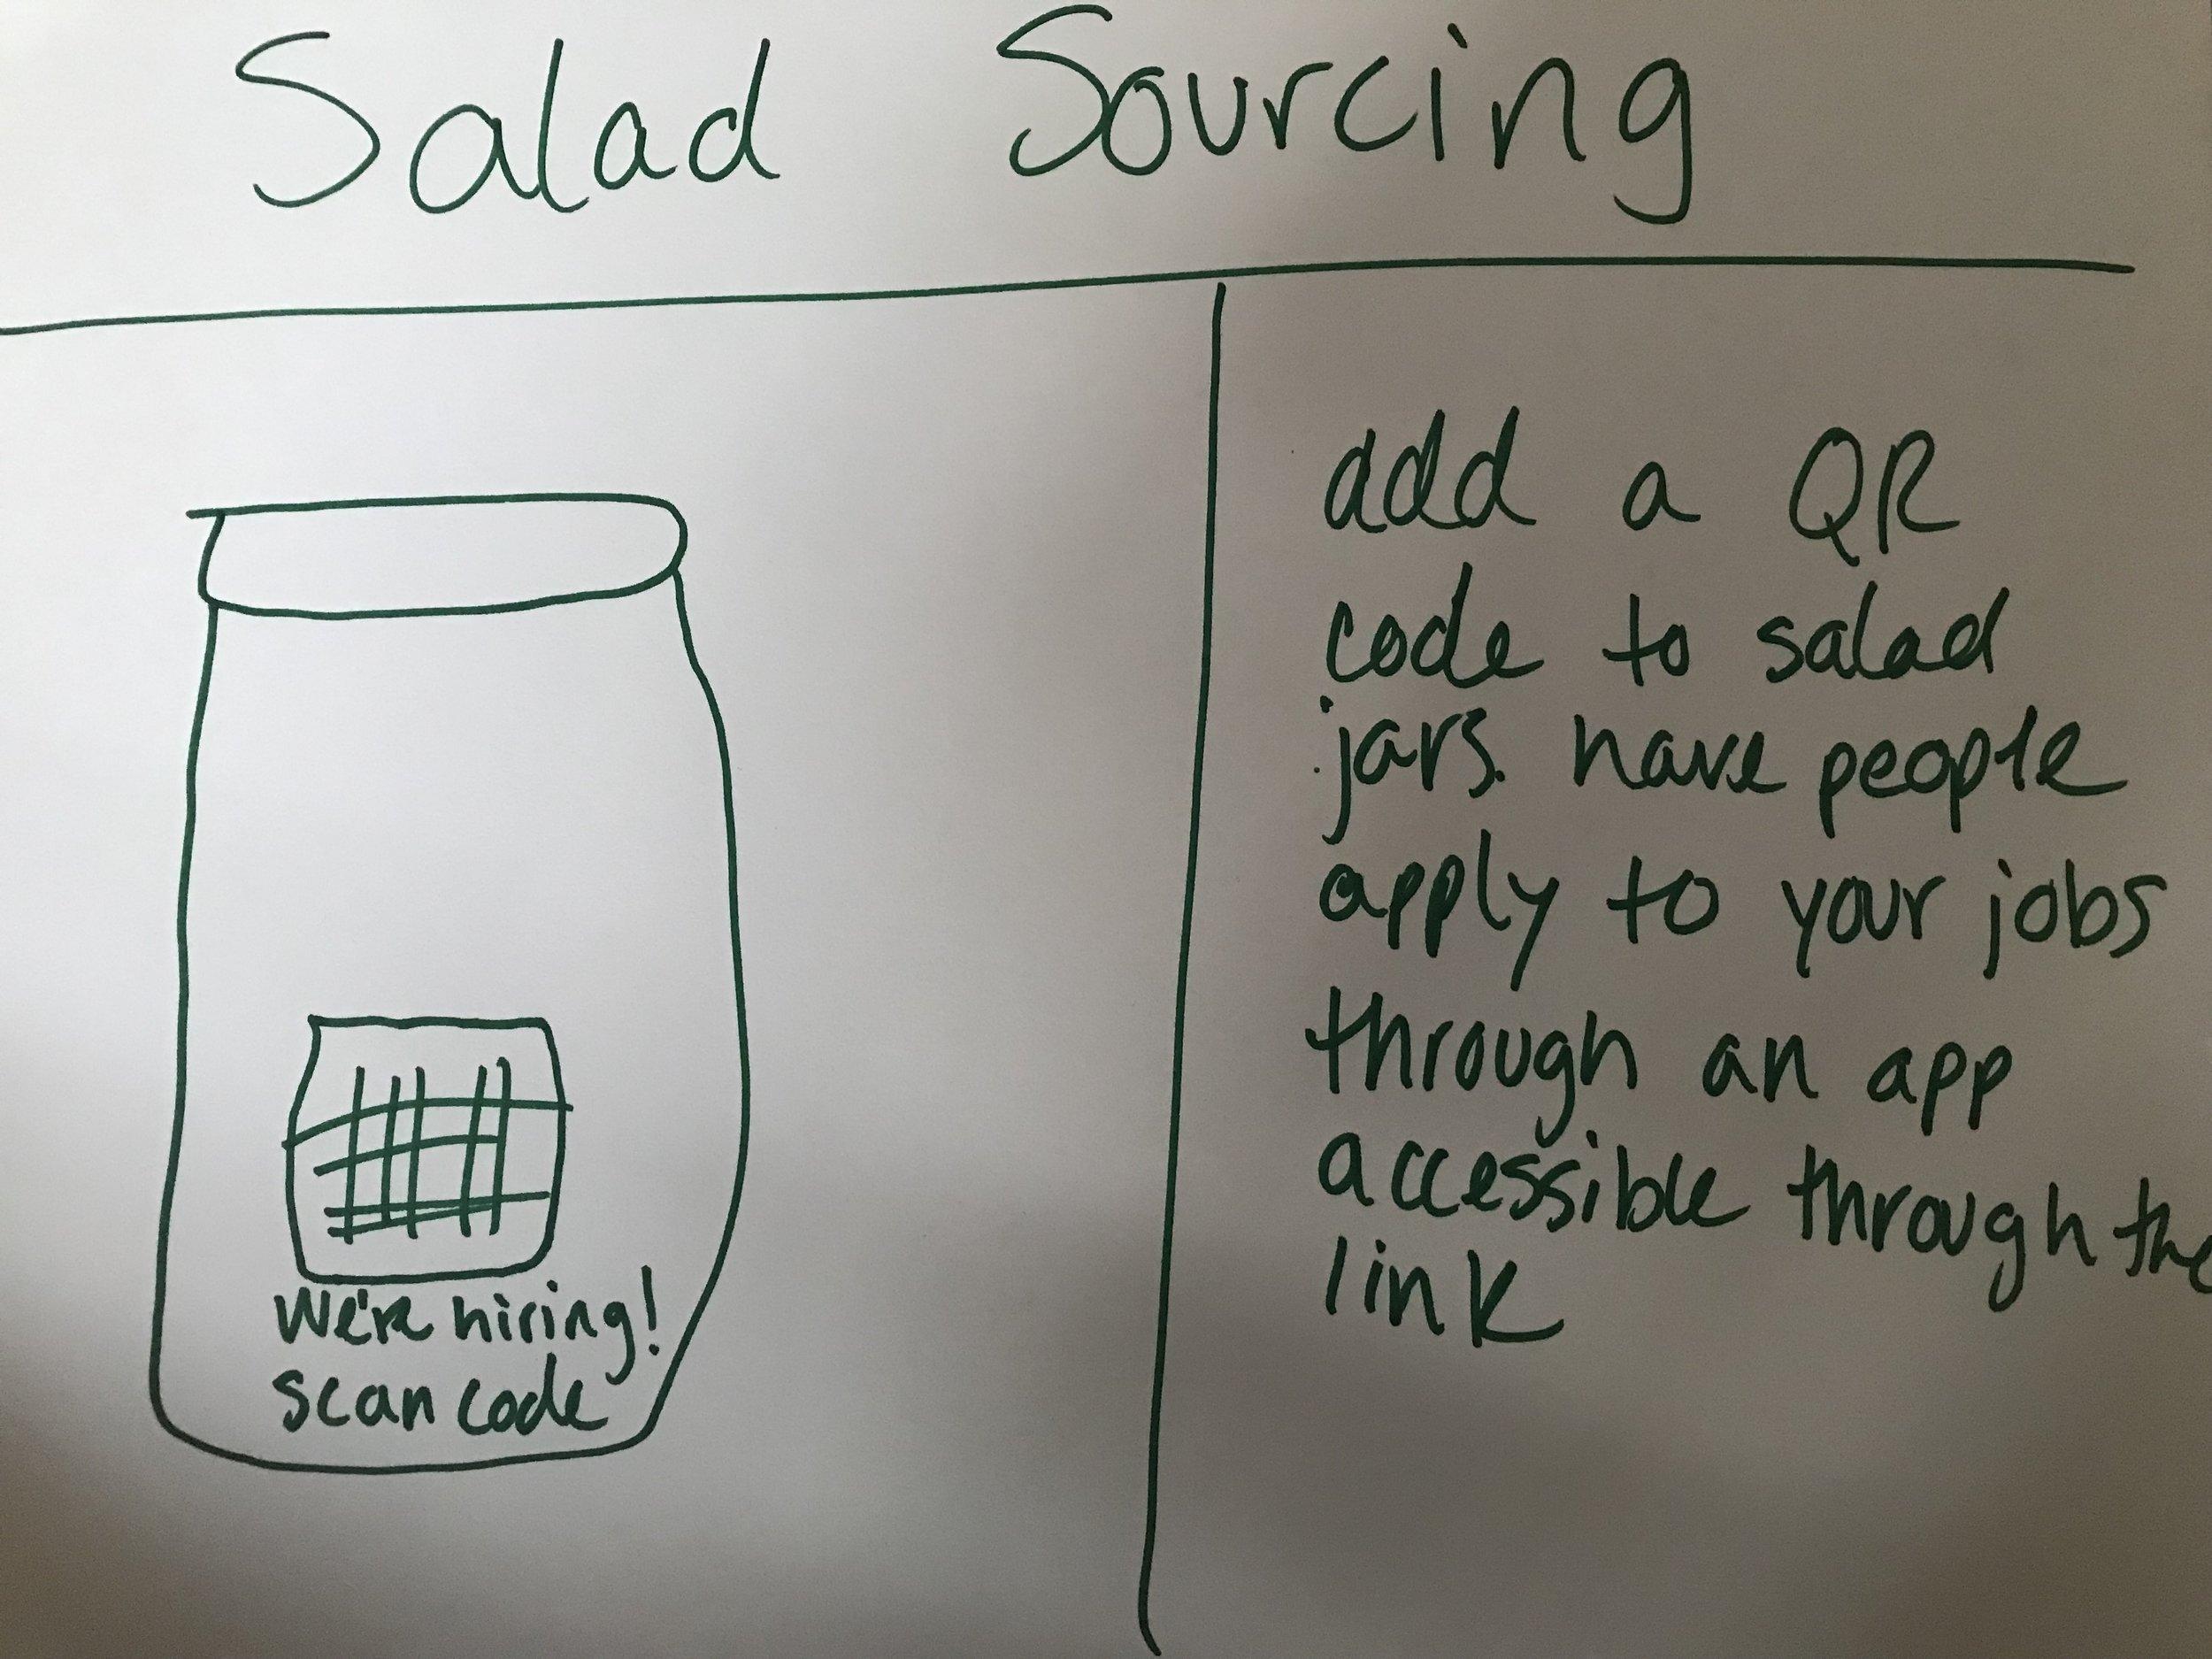 Salad Sourcing